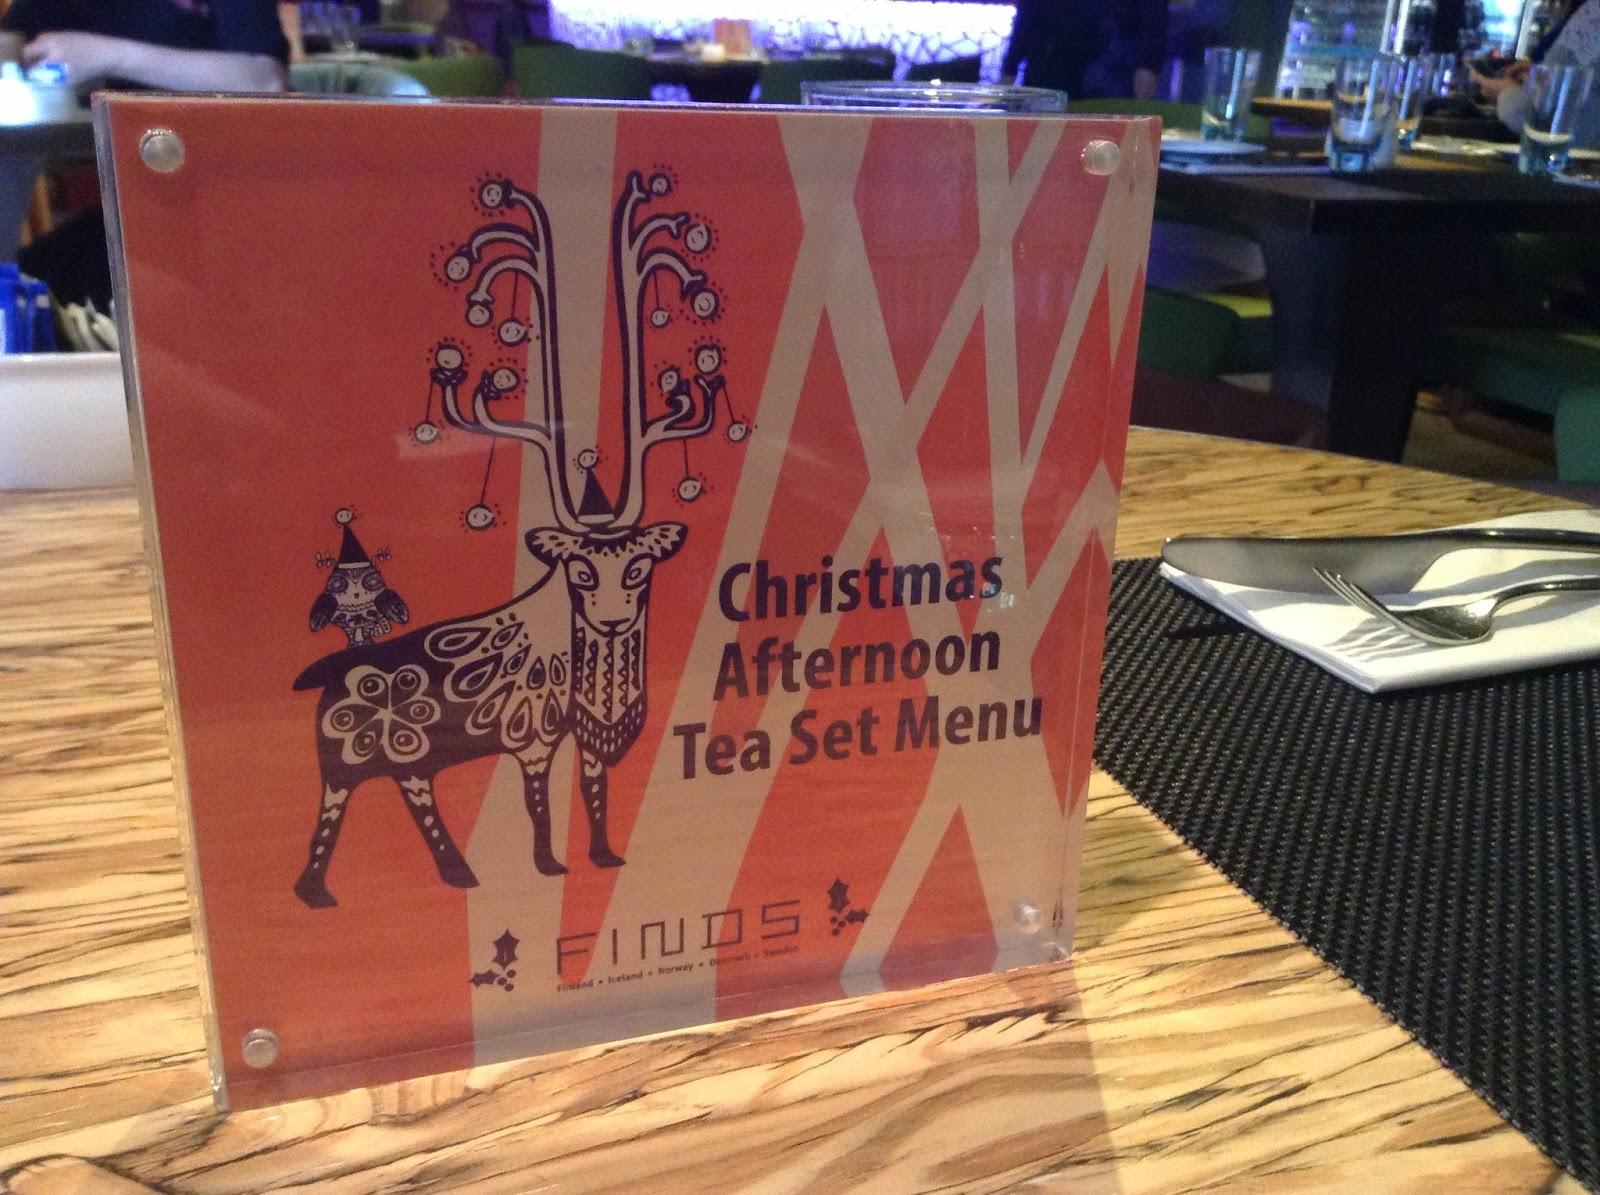 【Afternoon Tea分享】異常北歐甜點*聖誕老人家鄉下午茶@FINDSRestaurant & Bar